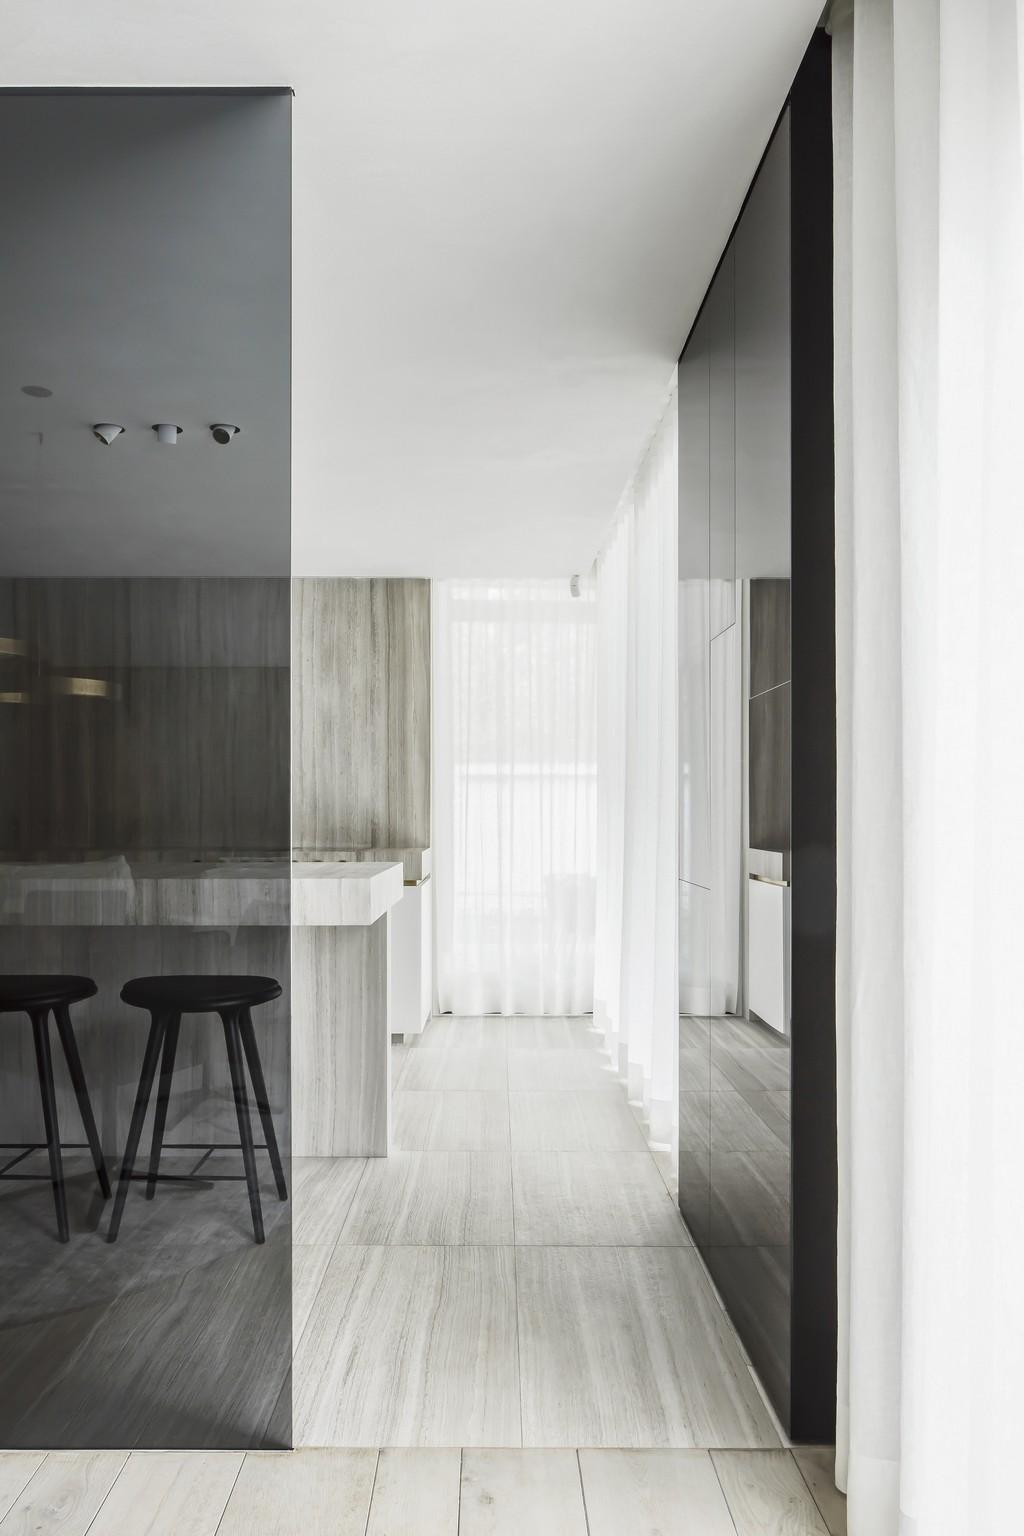 Keuken en vloer Oak Grey - Ontwerp SAAI - Foto Piet-Albert Goethals